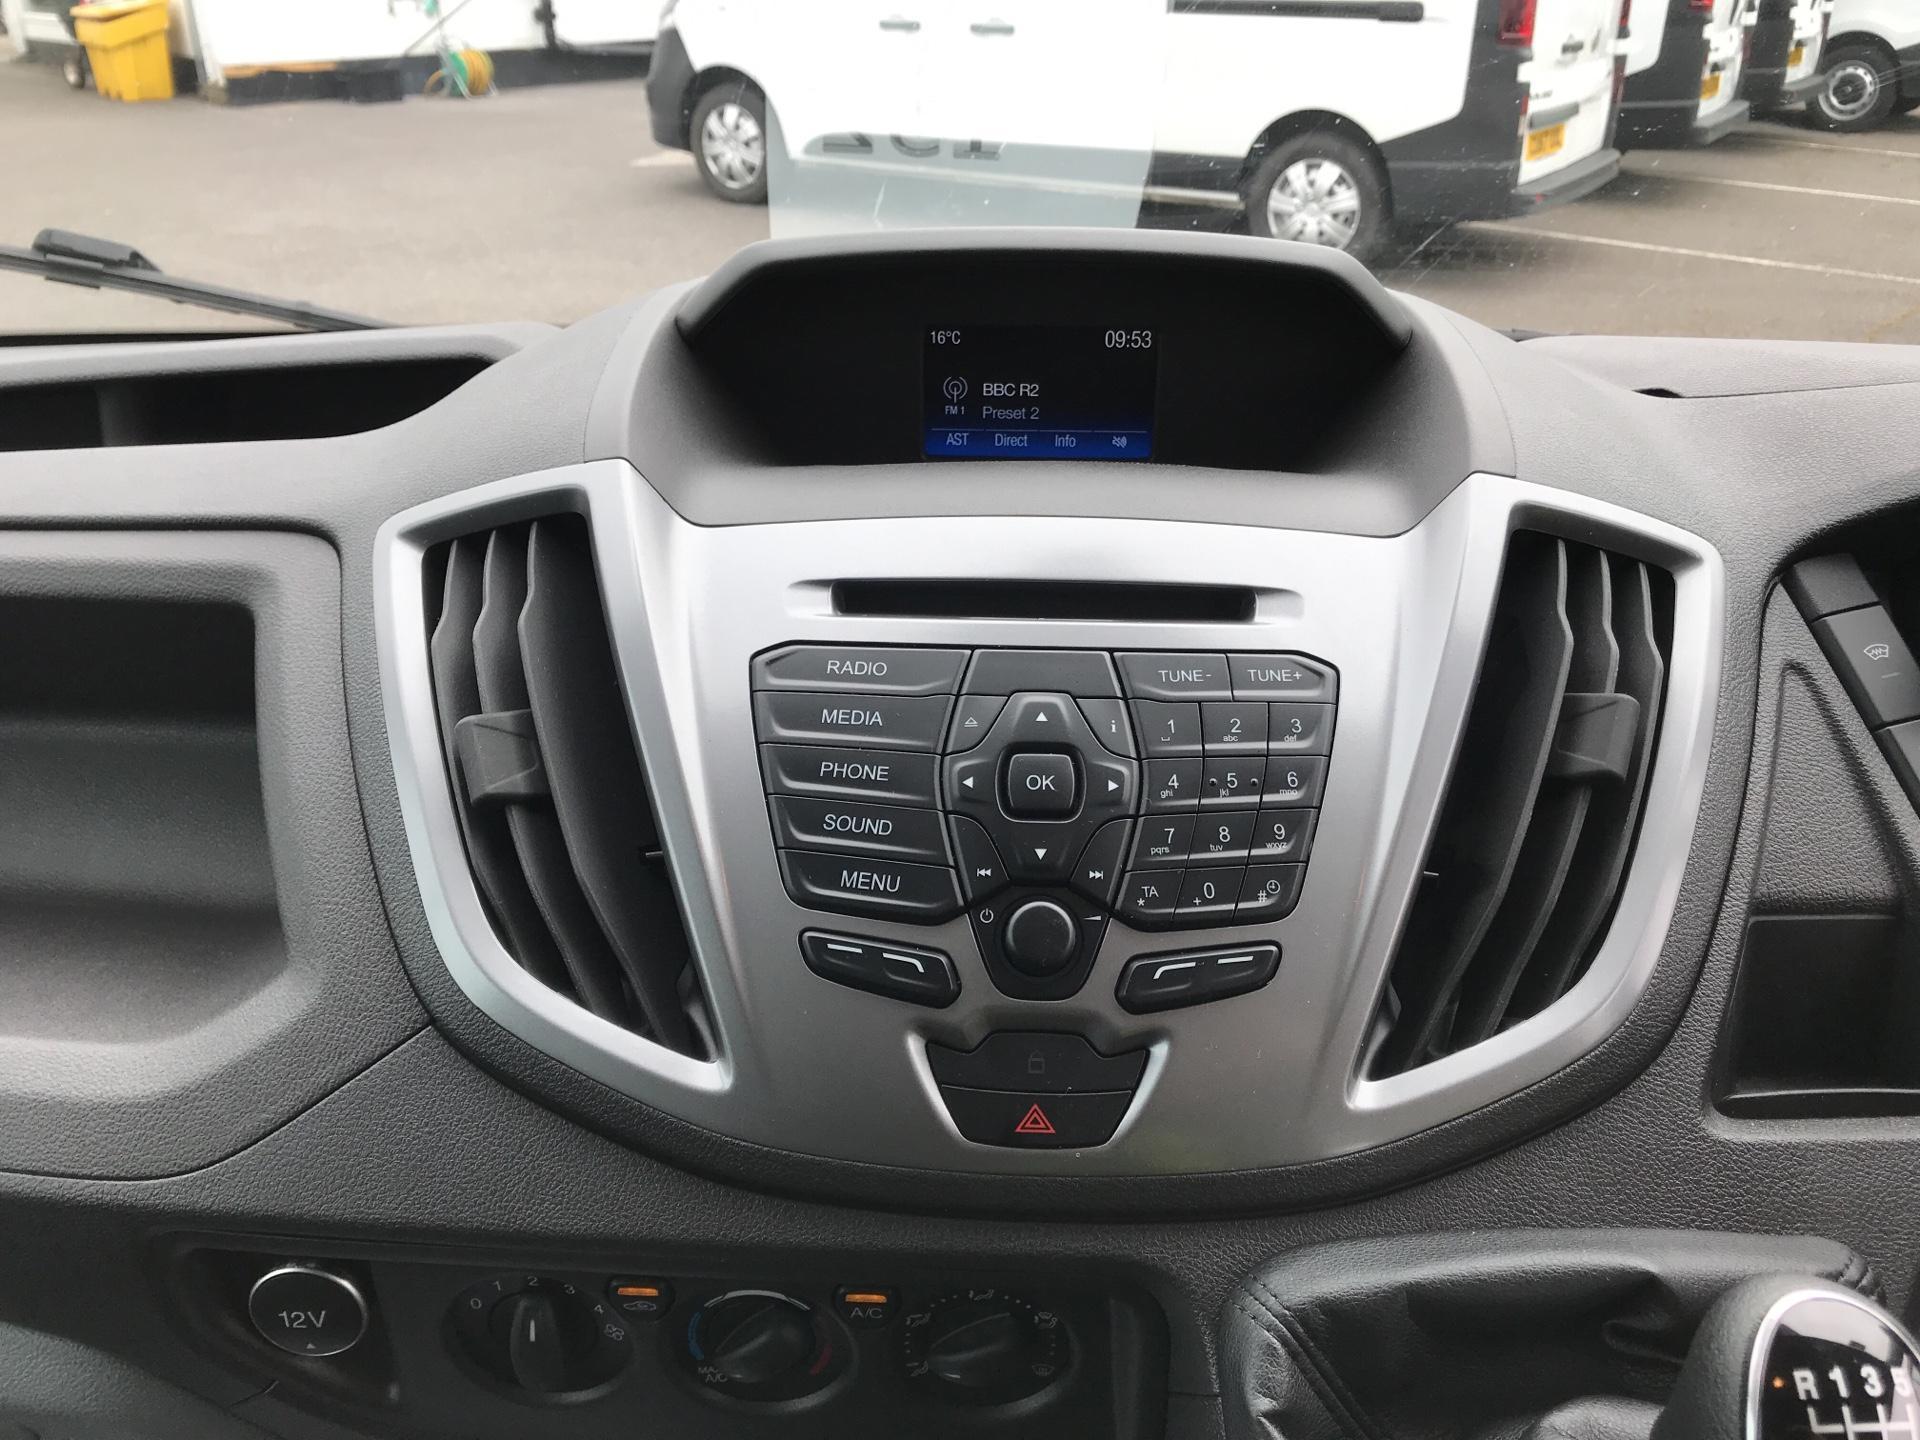 2018 Ford Transit 2.0 Tdci 130Ps H2 D/Cab Van EURO 6 (AO68SXU) Image 10